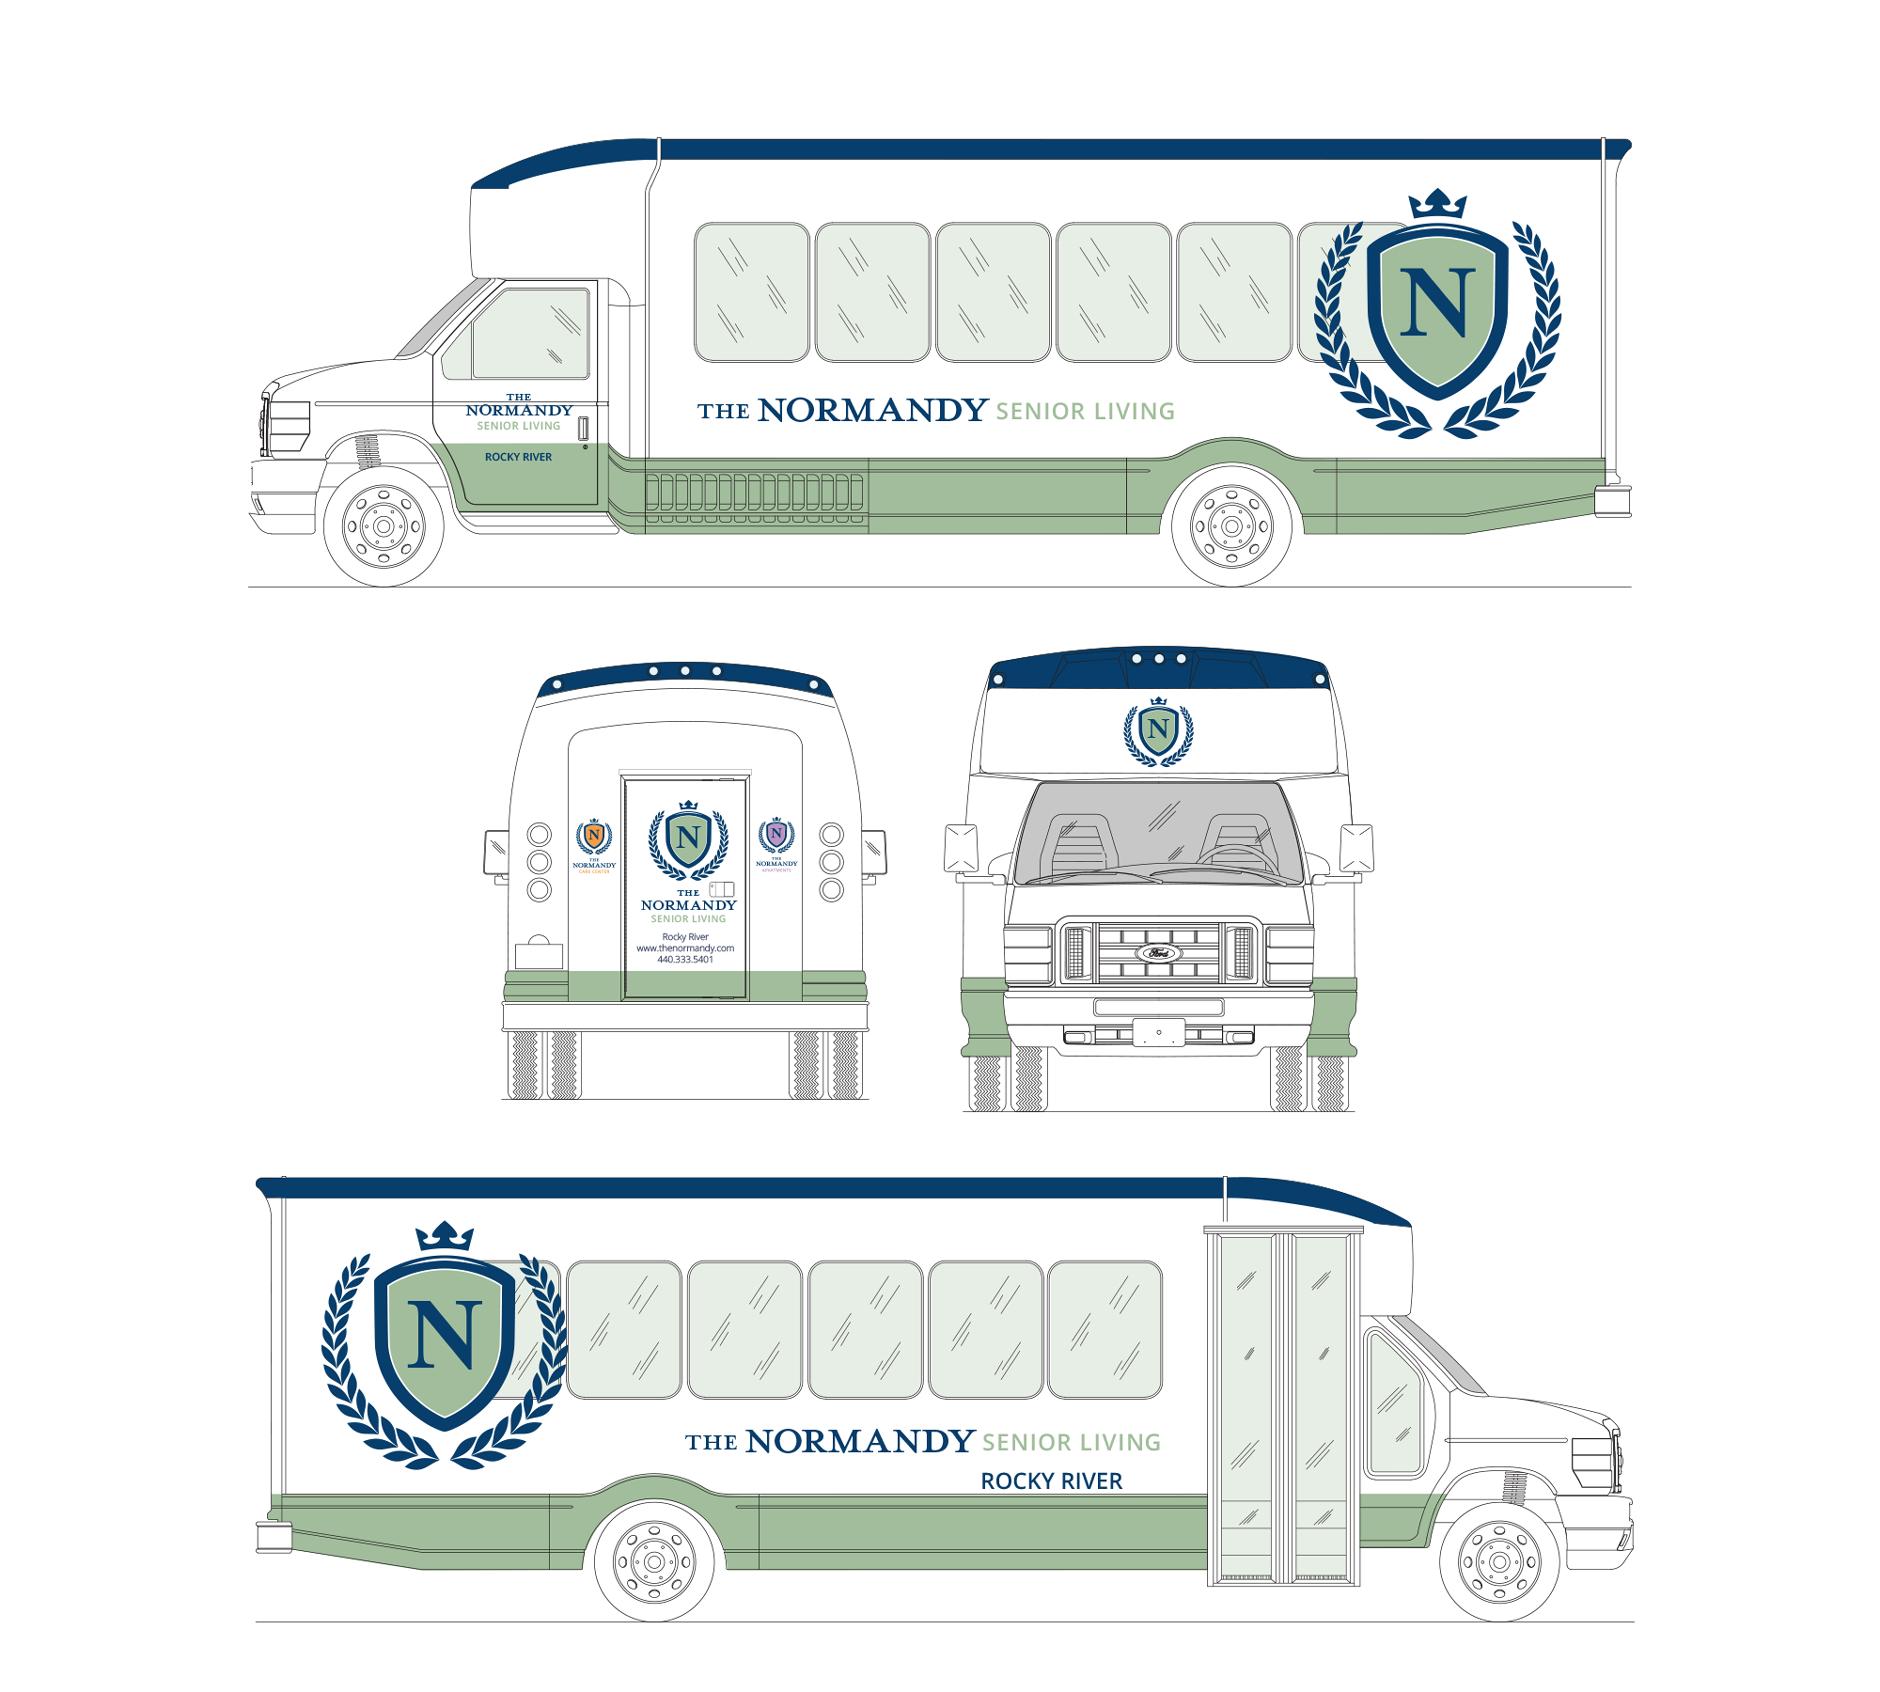 The Normandy Senior Living Fleet Bus Graphic | Rebranding Agency